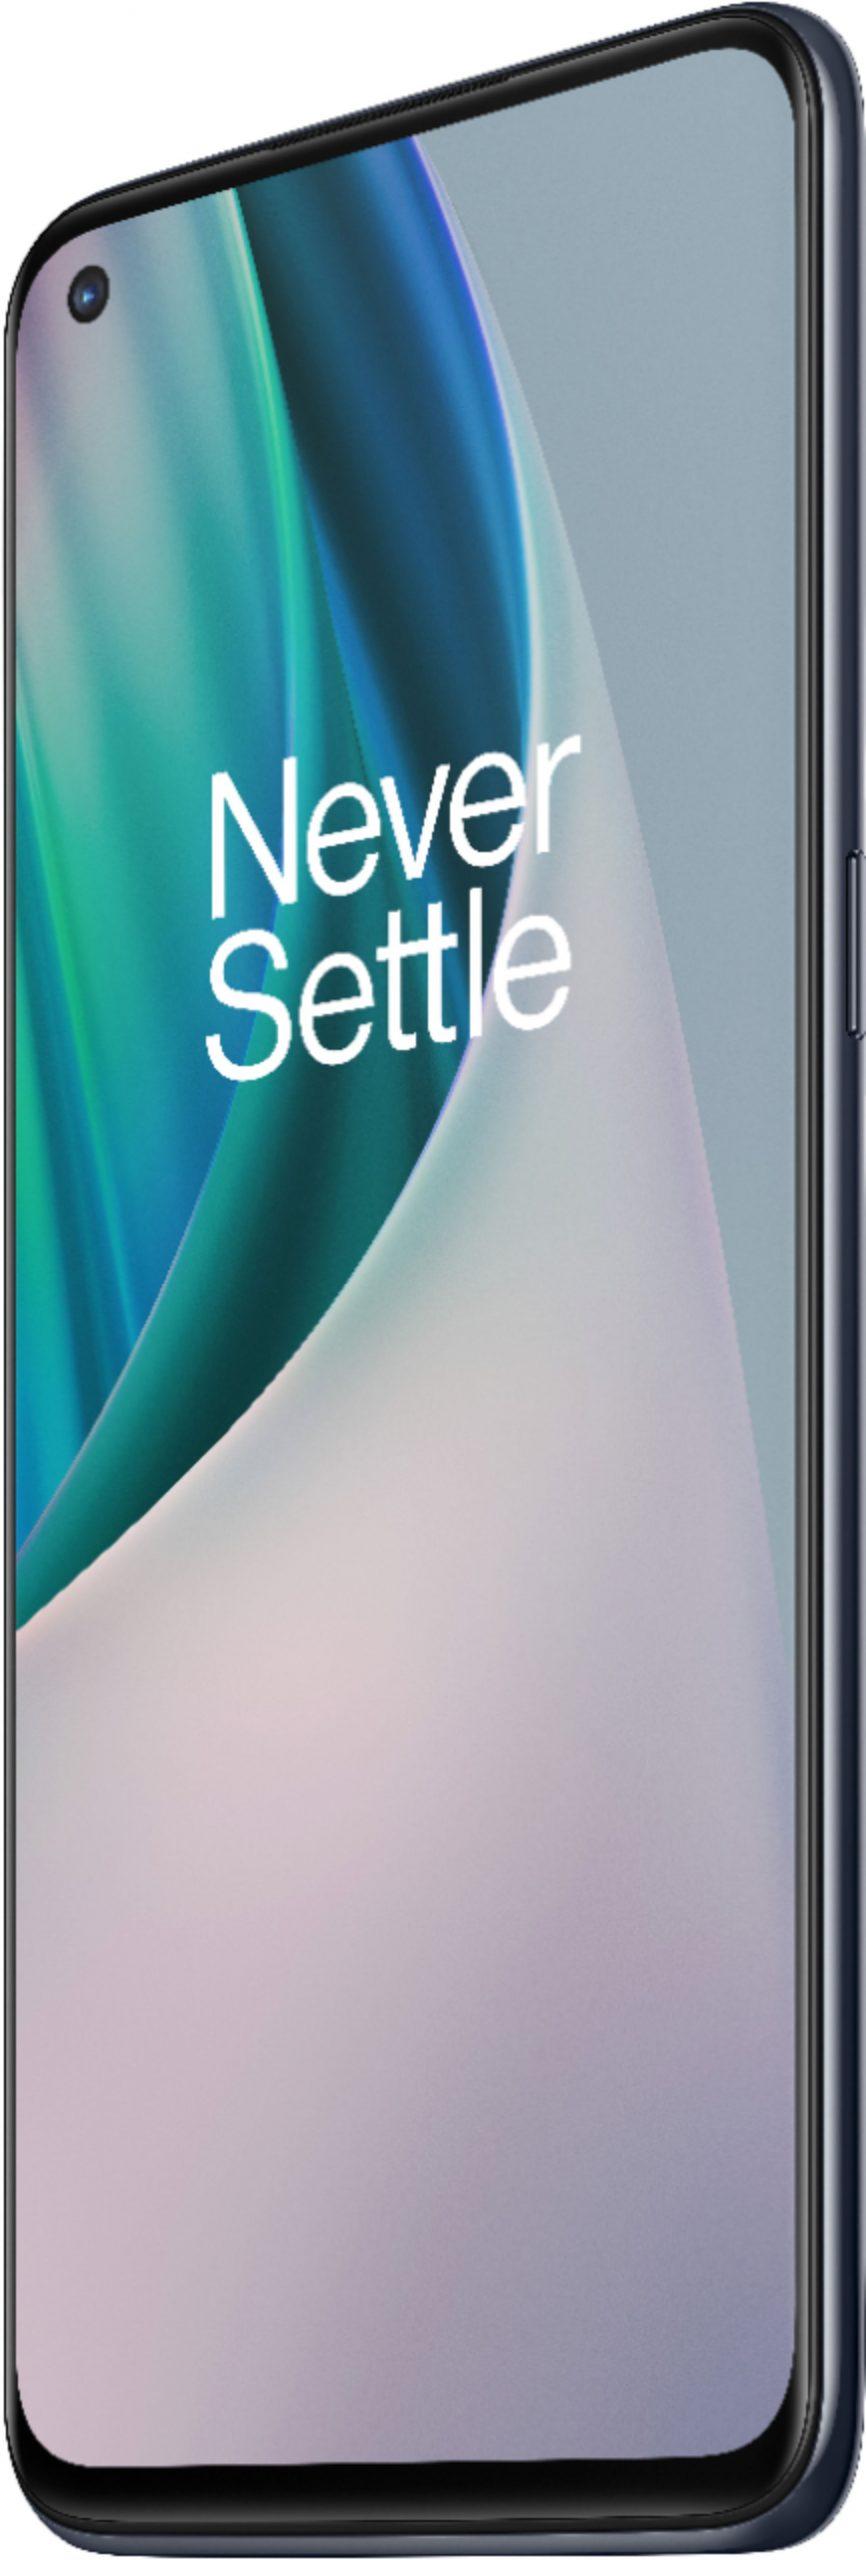 OnePlus Nord N10 5G 6/128GB Midnight Ice - 2